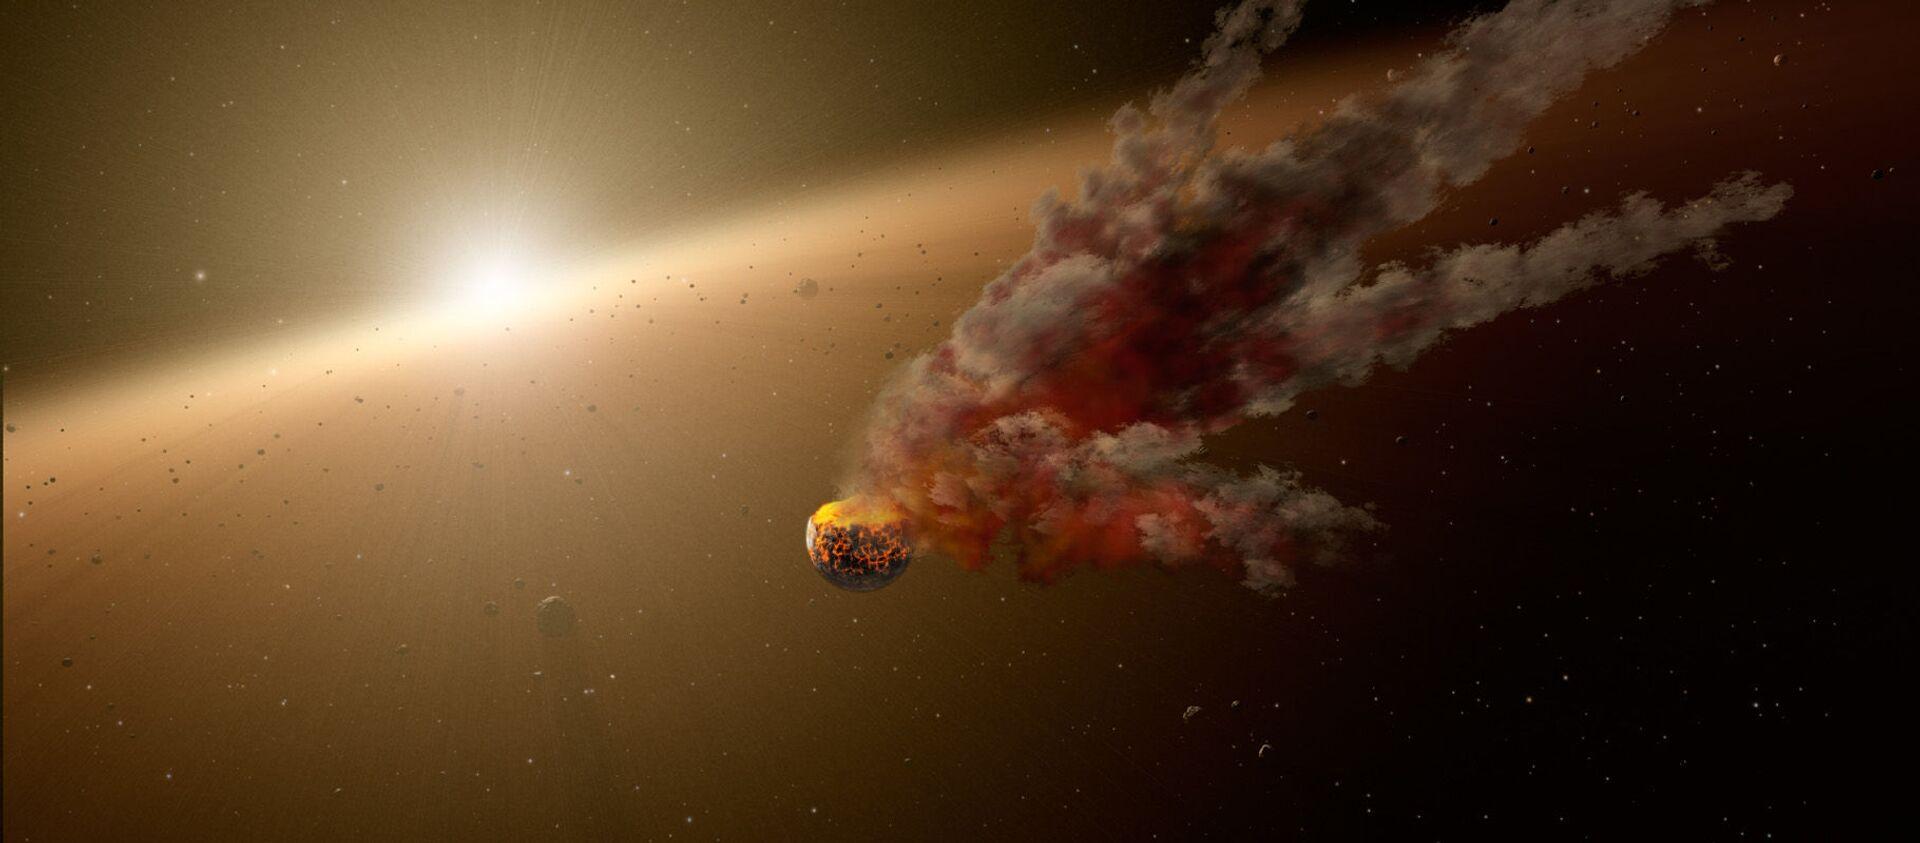 Asteroide - Sputnik Italia, 1920, 12.04.2021